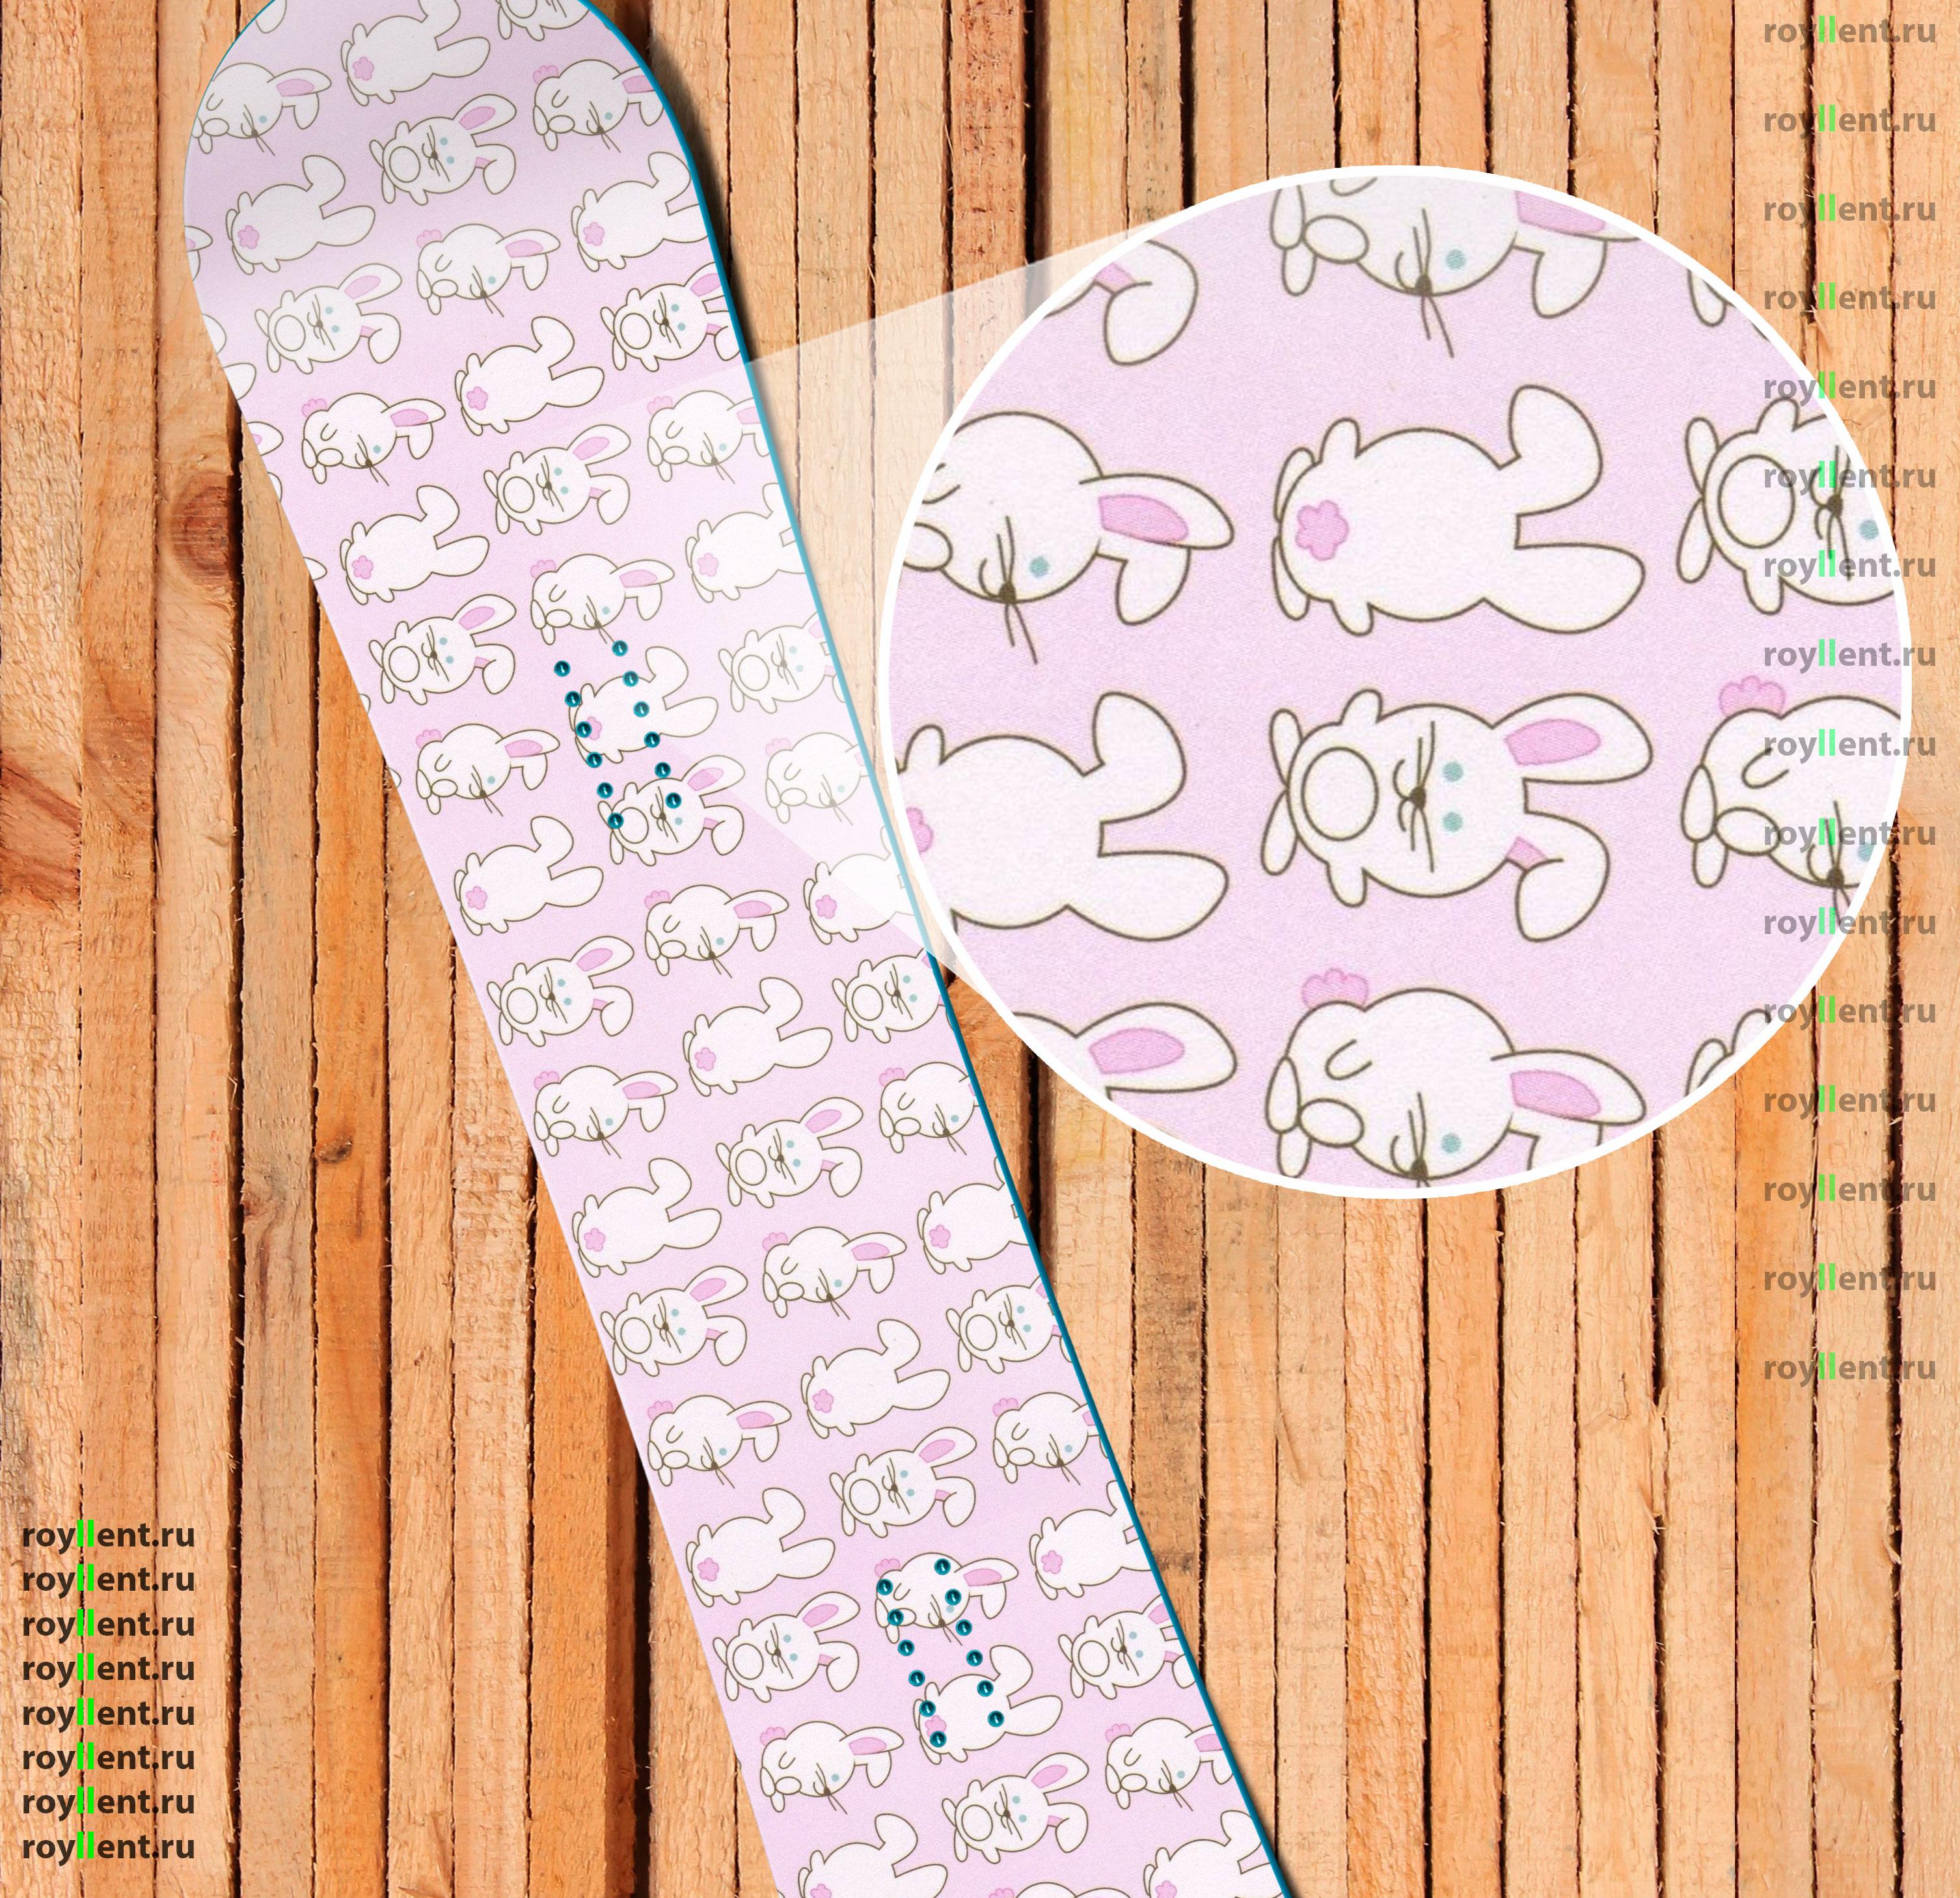 2016 White Rabbit Snowboard design